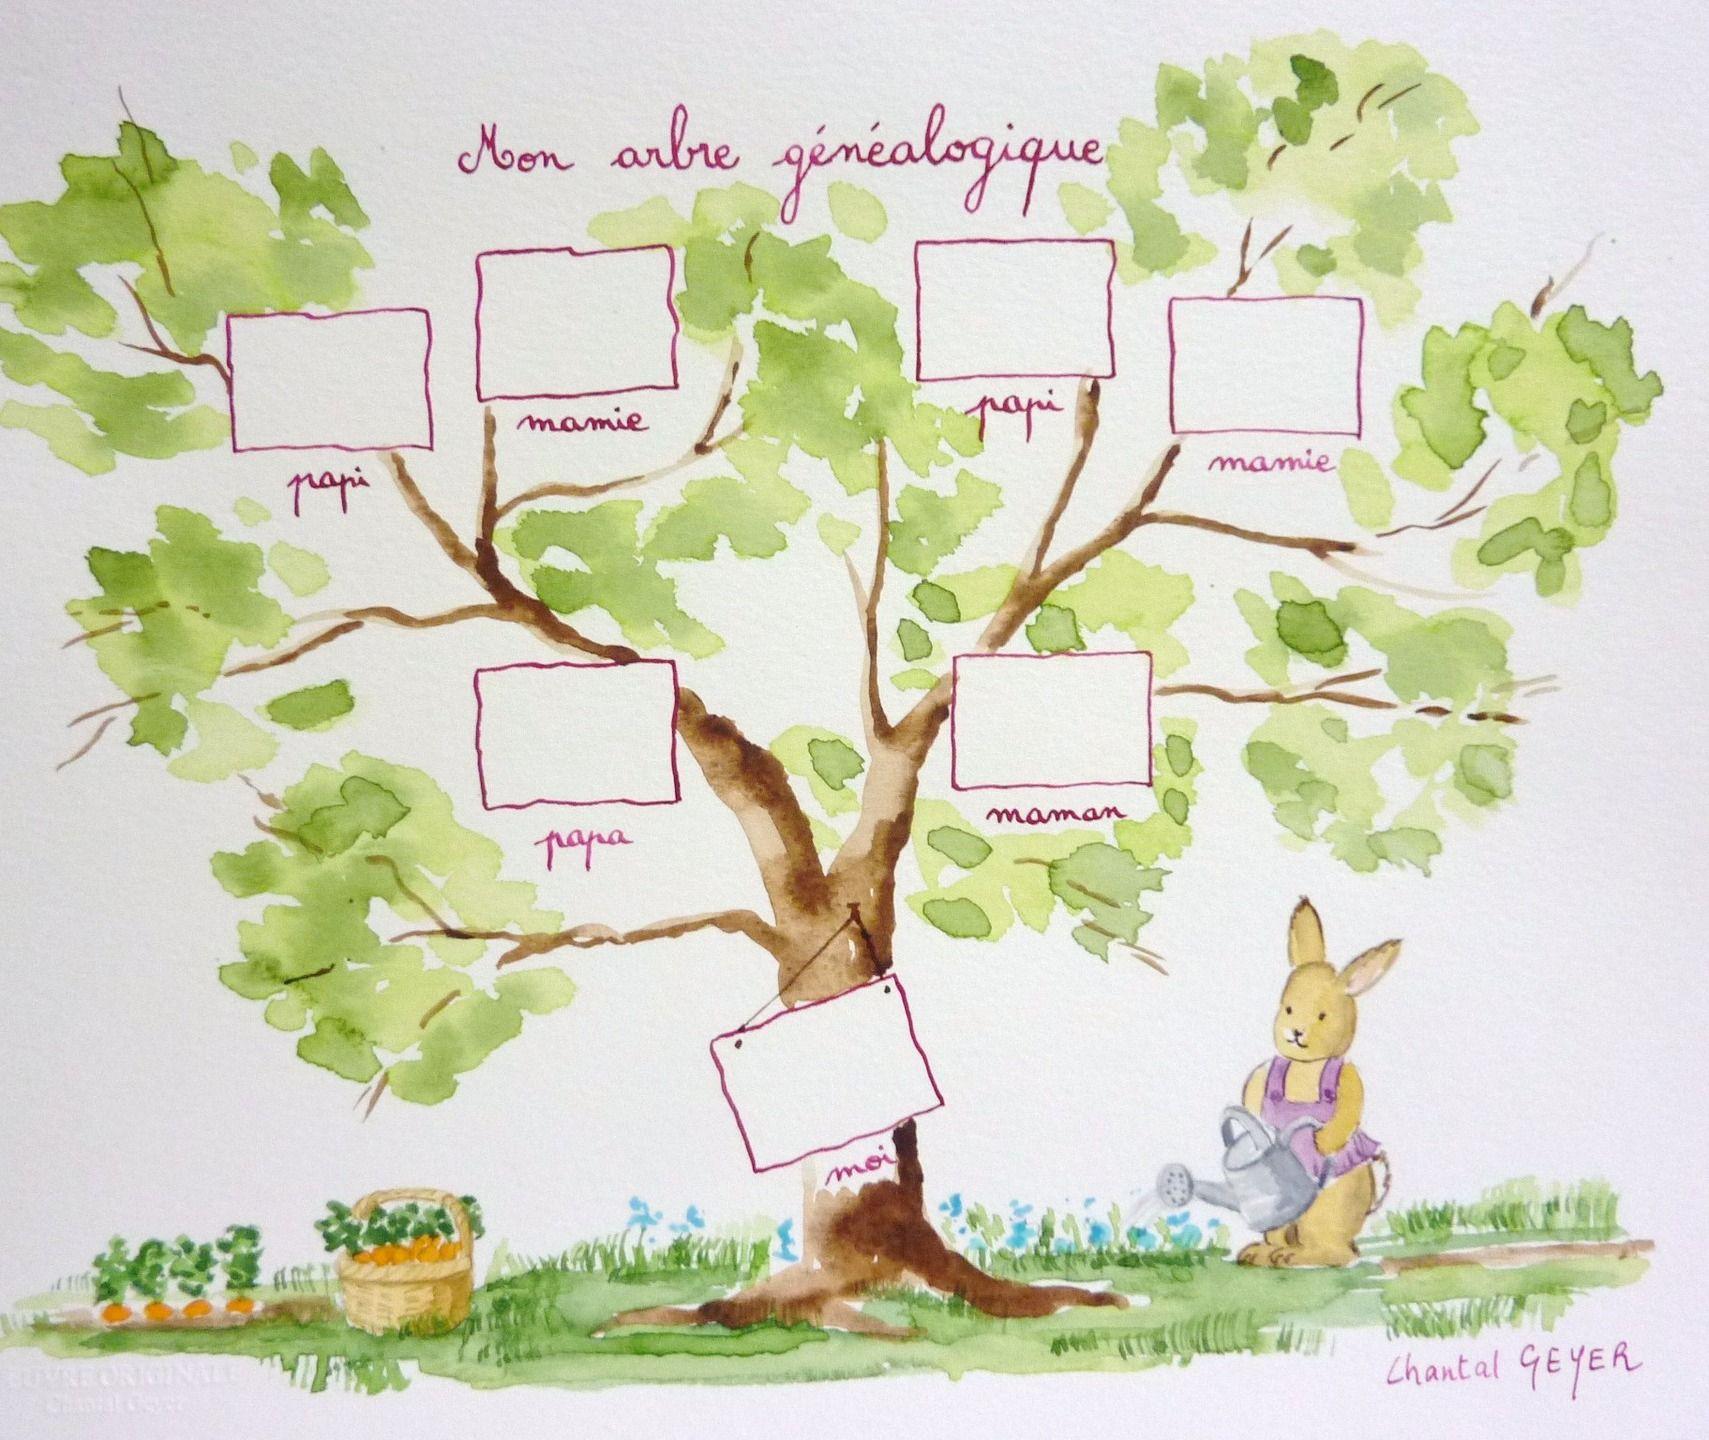 Arbre Genealogique A Remplir 3 Generations Ascendantes Chambre D Enfant De Bebe Par Lin D